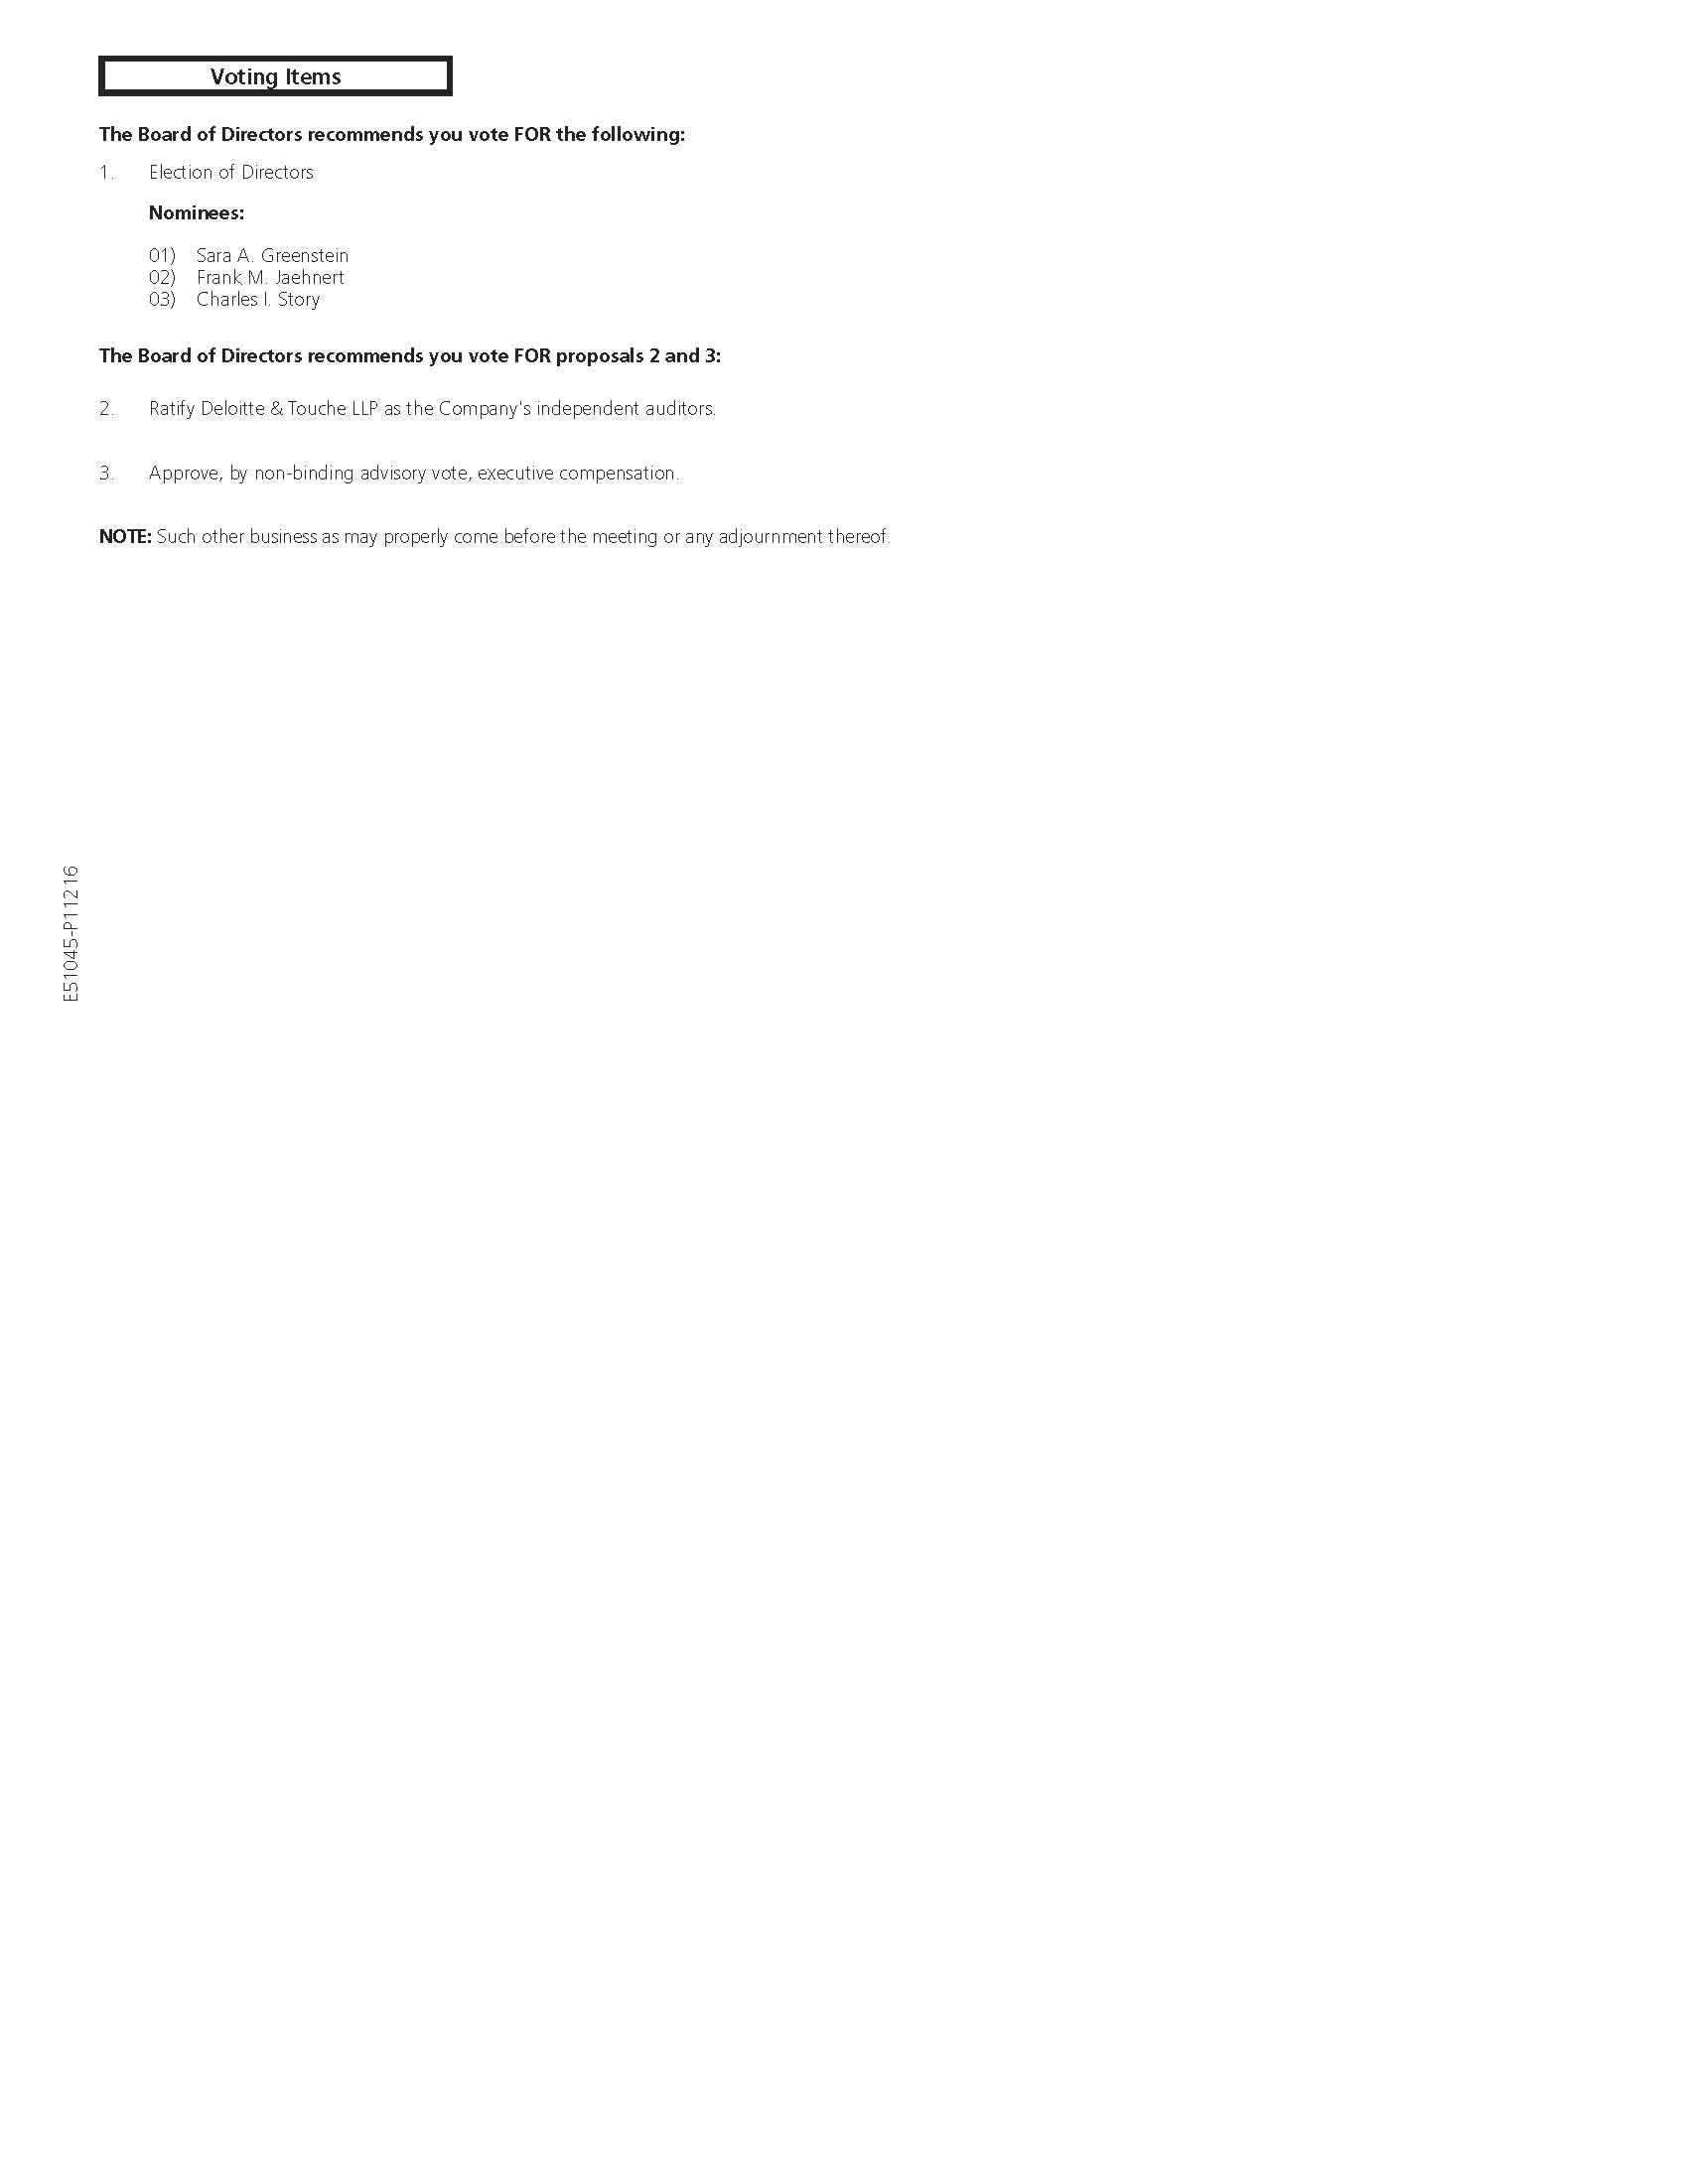 NOTICECARDPAGE3.JPG